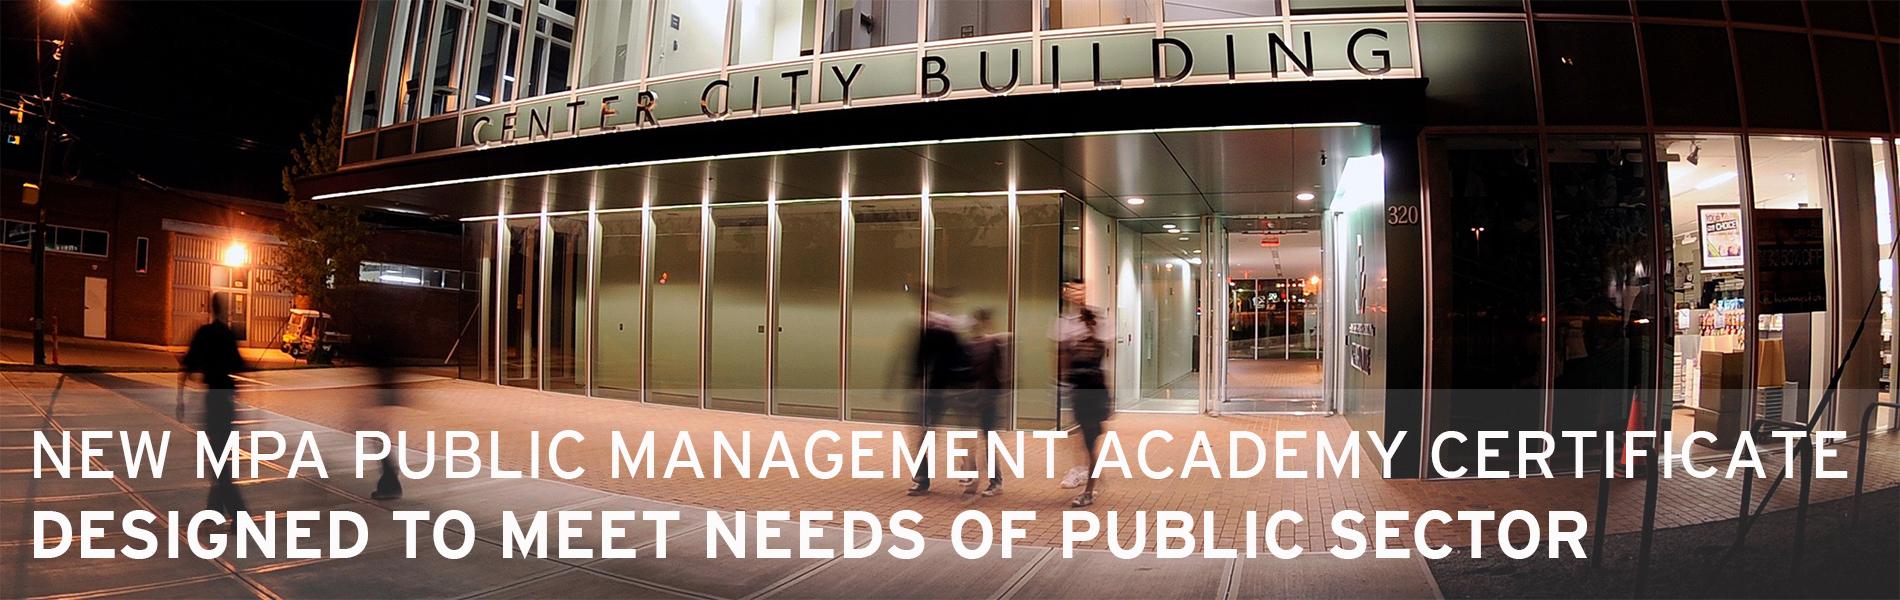 MPA academy certificate